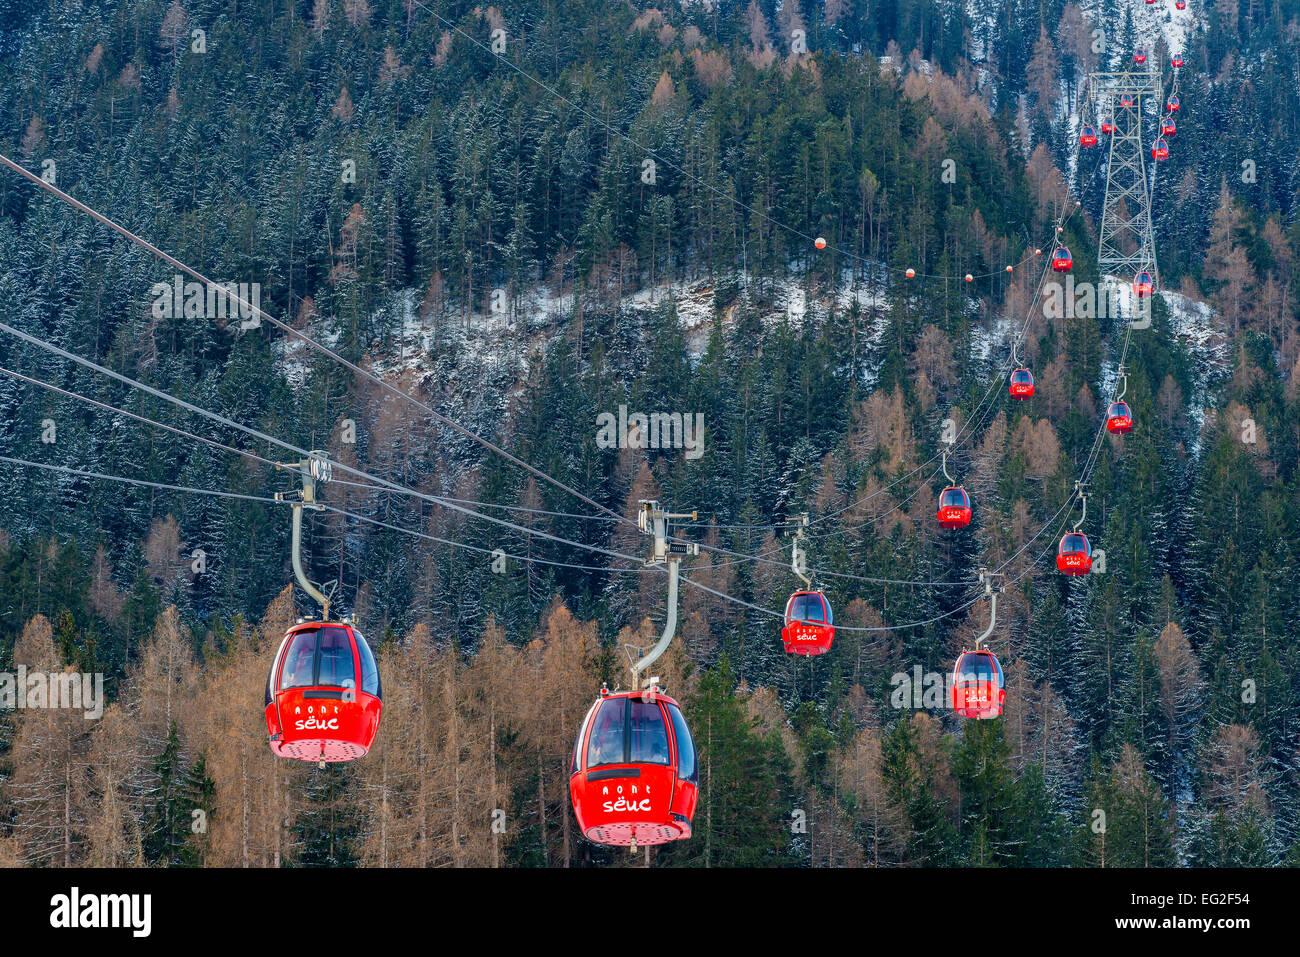 Seiser Alm or Alpe di Siusi gondola lift, Ortisei or St Ulrich, Val Gardena, Alto Adige - South Tyrol, Italy - Stock Image